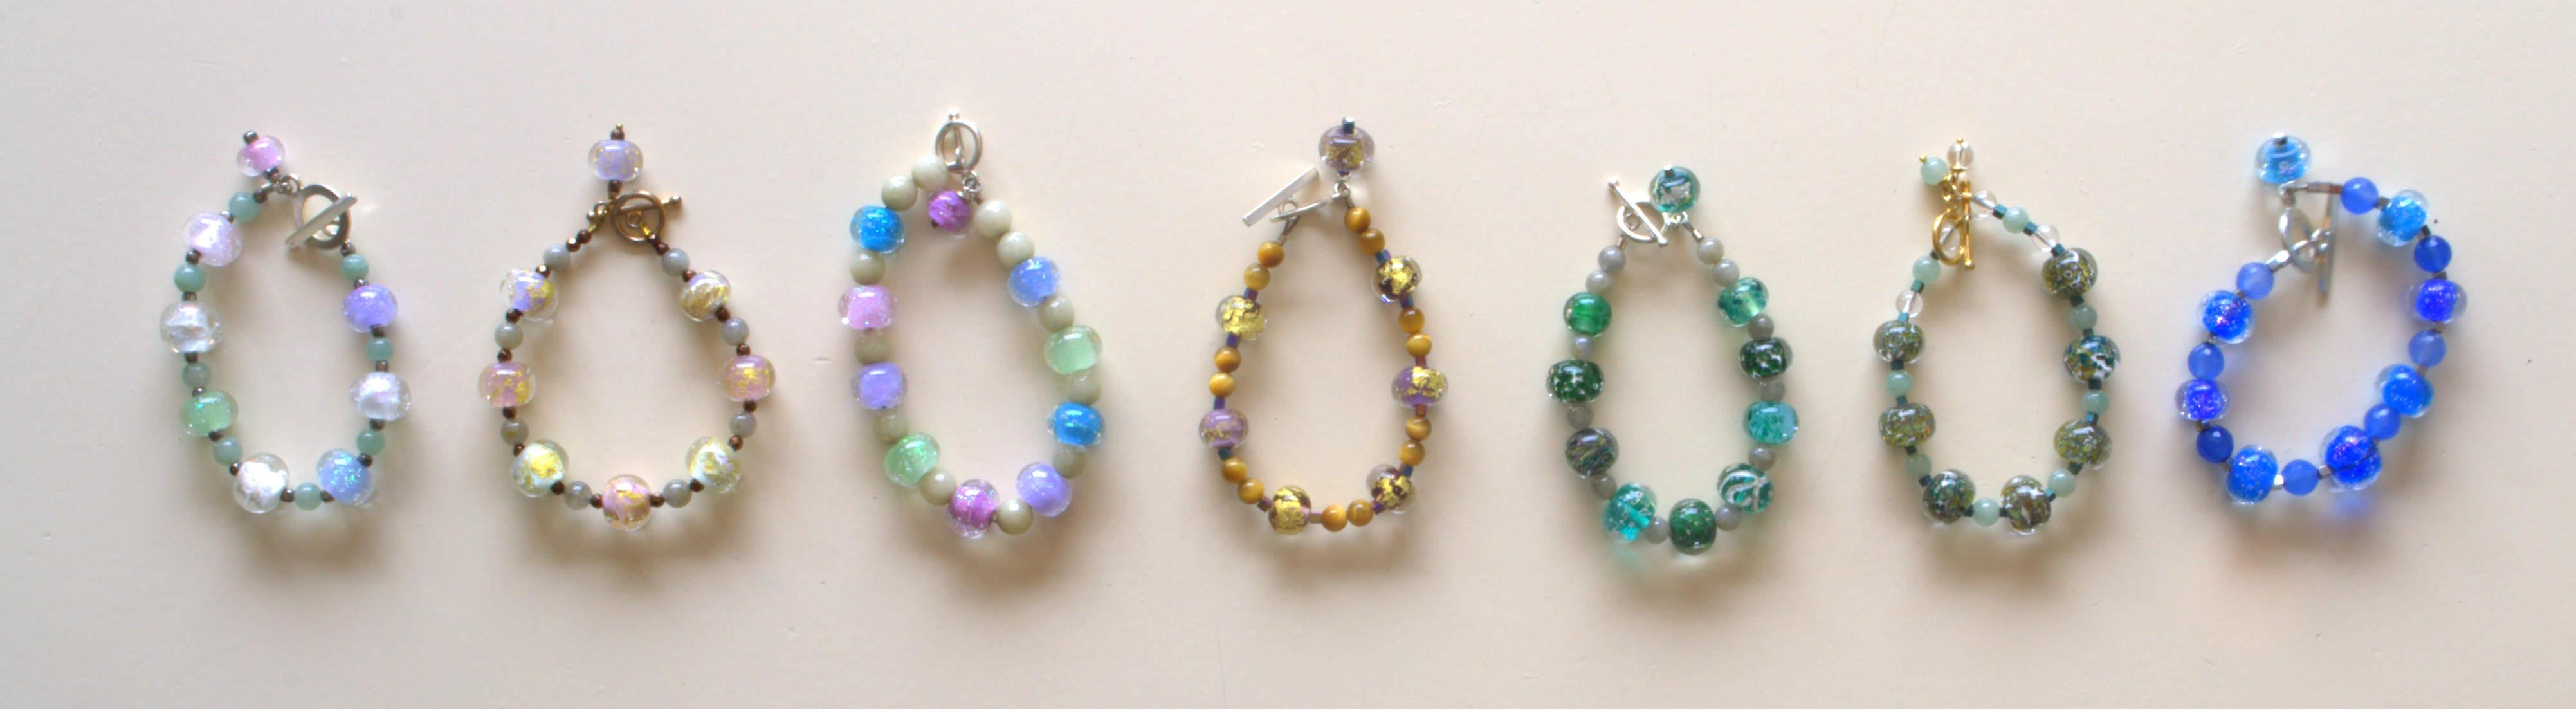 handmade beaded jewelry websites style guru fashion